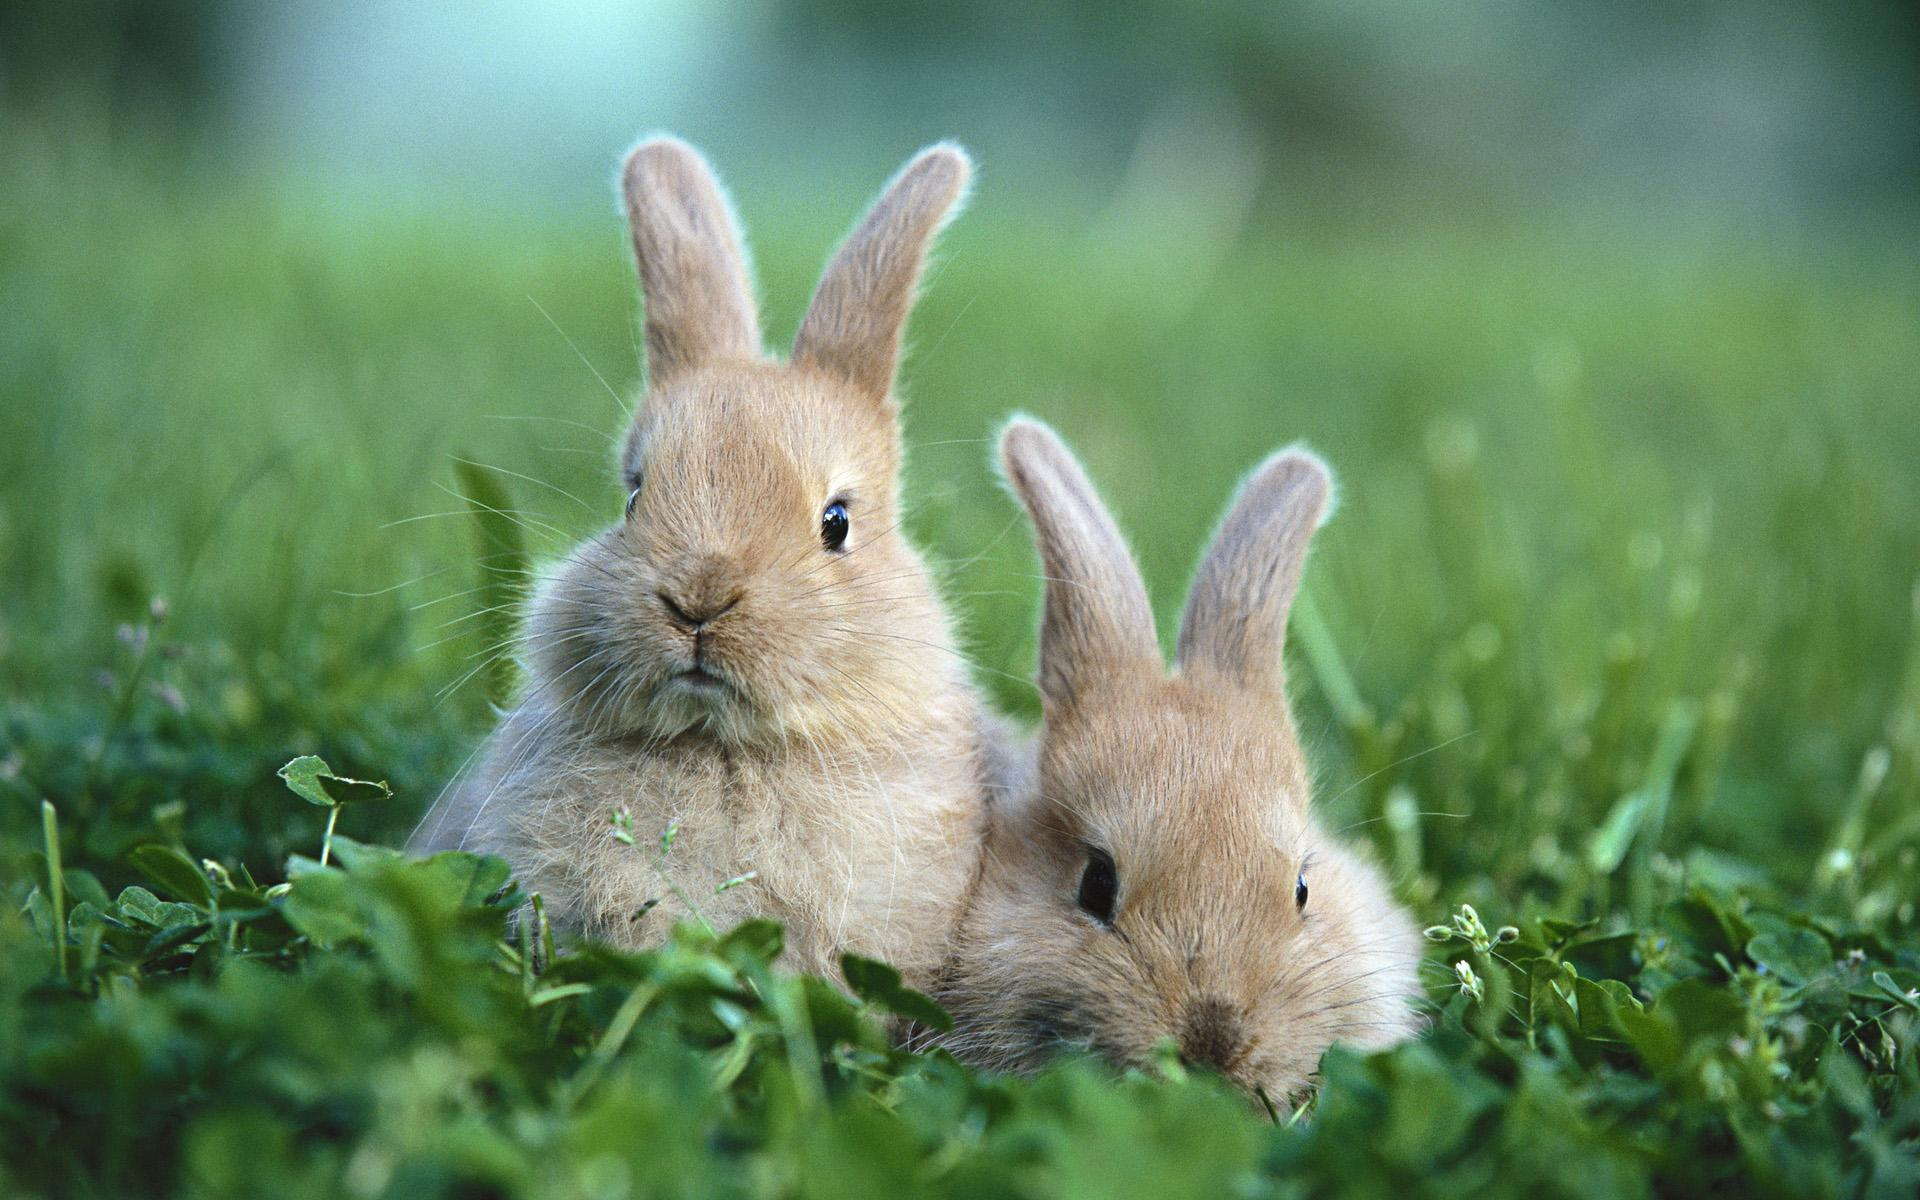 brambley hedge rabbit rescue phoenix rabbit shelterbrambley